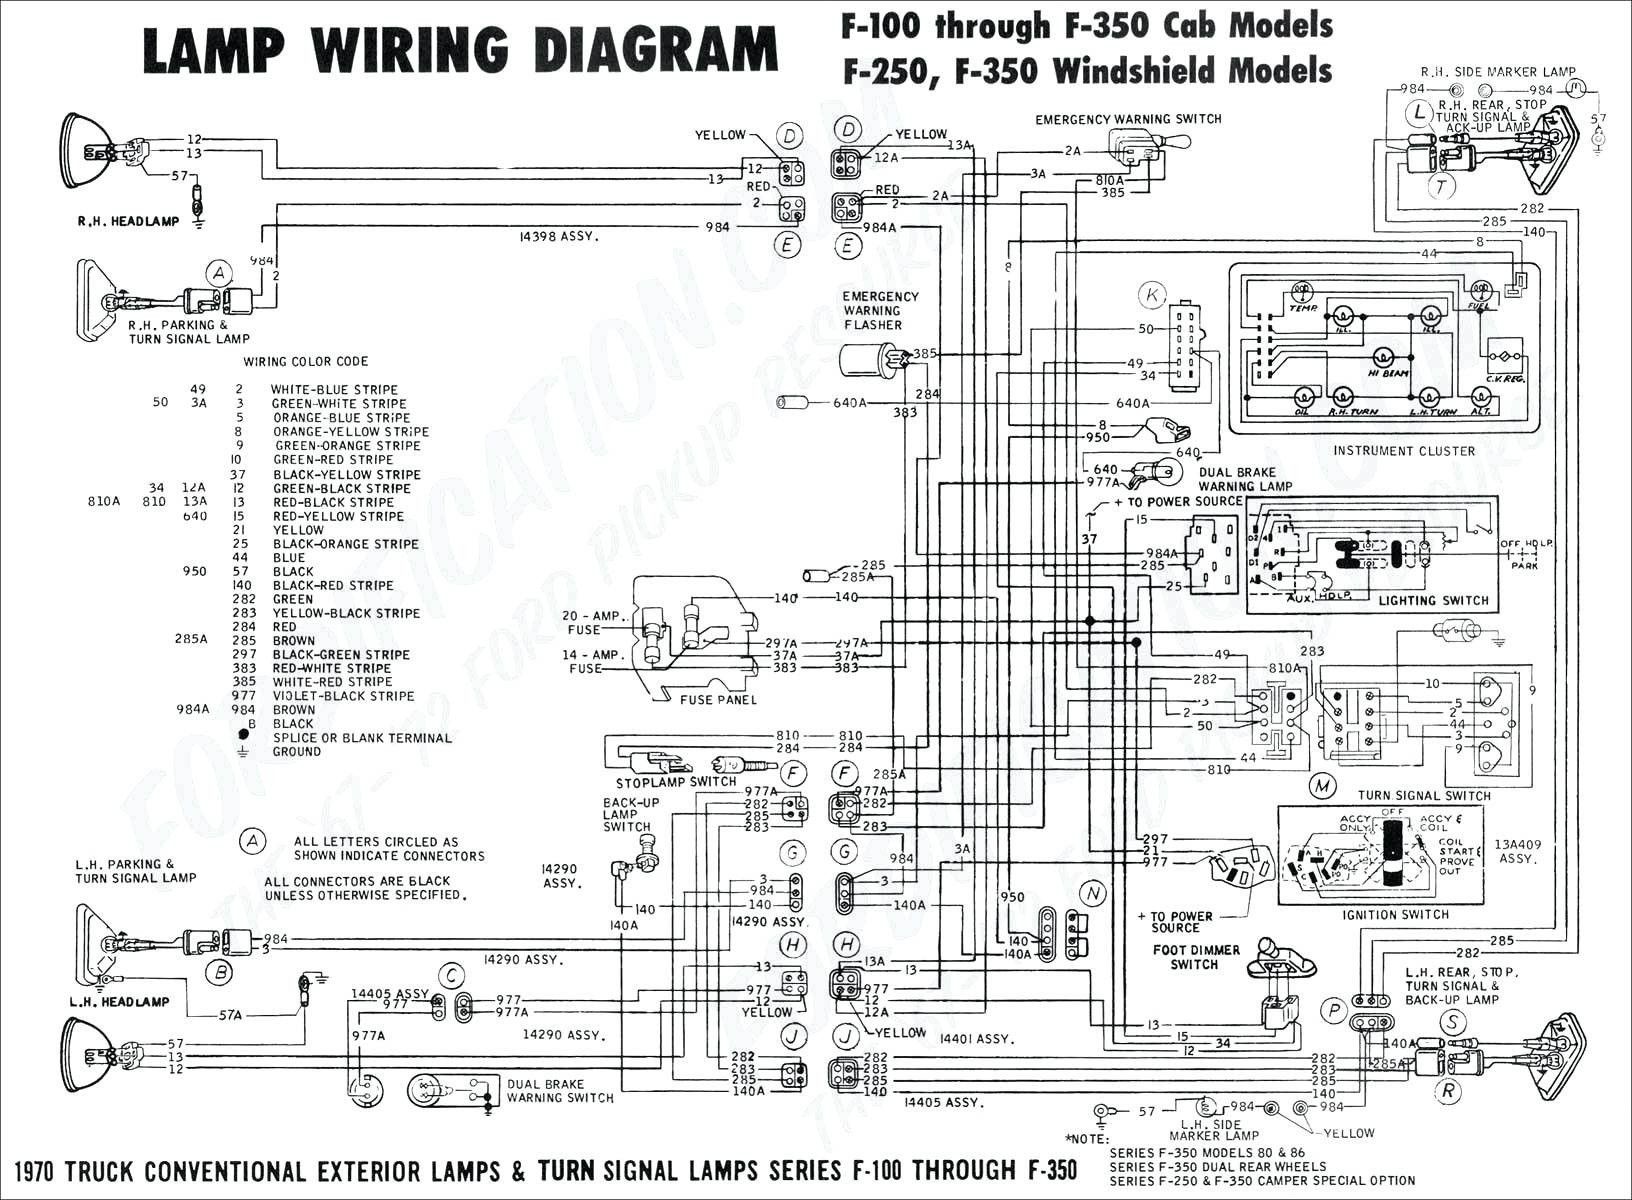 1992 toyota Paseo Engine Diagram Wiring Diagram Alternator toyota Camry 1992 Schematics Wiring Of 1992 toyota Paseo Engine Diagram